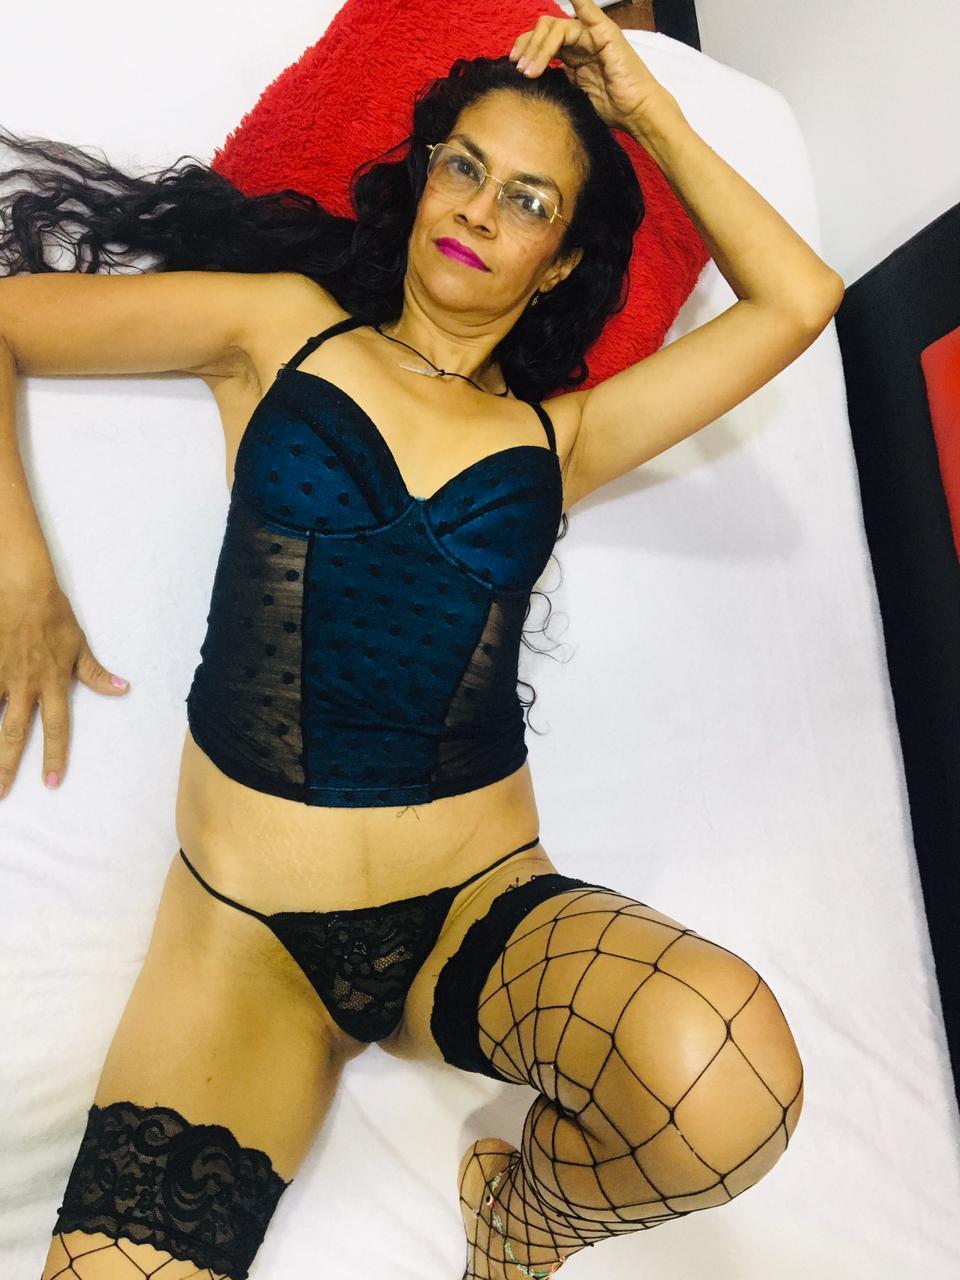 Maya black1?s=g6ay51bmgdh8vx5lk1yy9pvxws0slj7rfdbqq+2bobm=